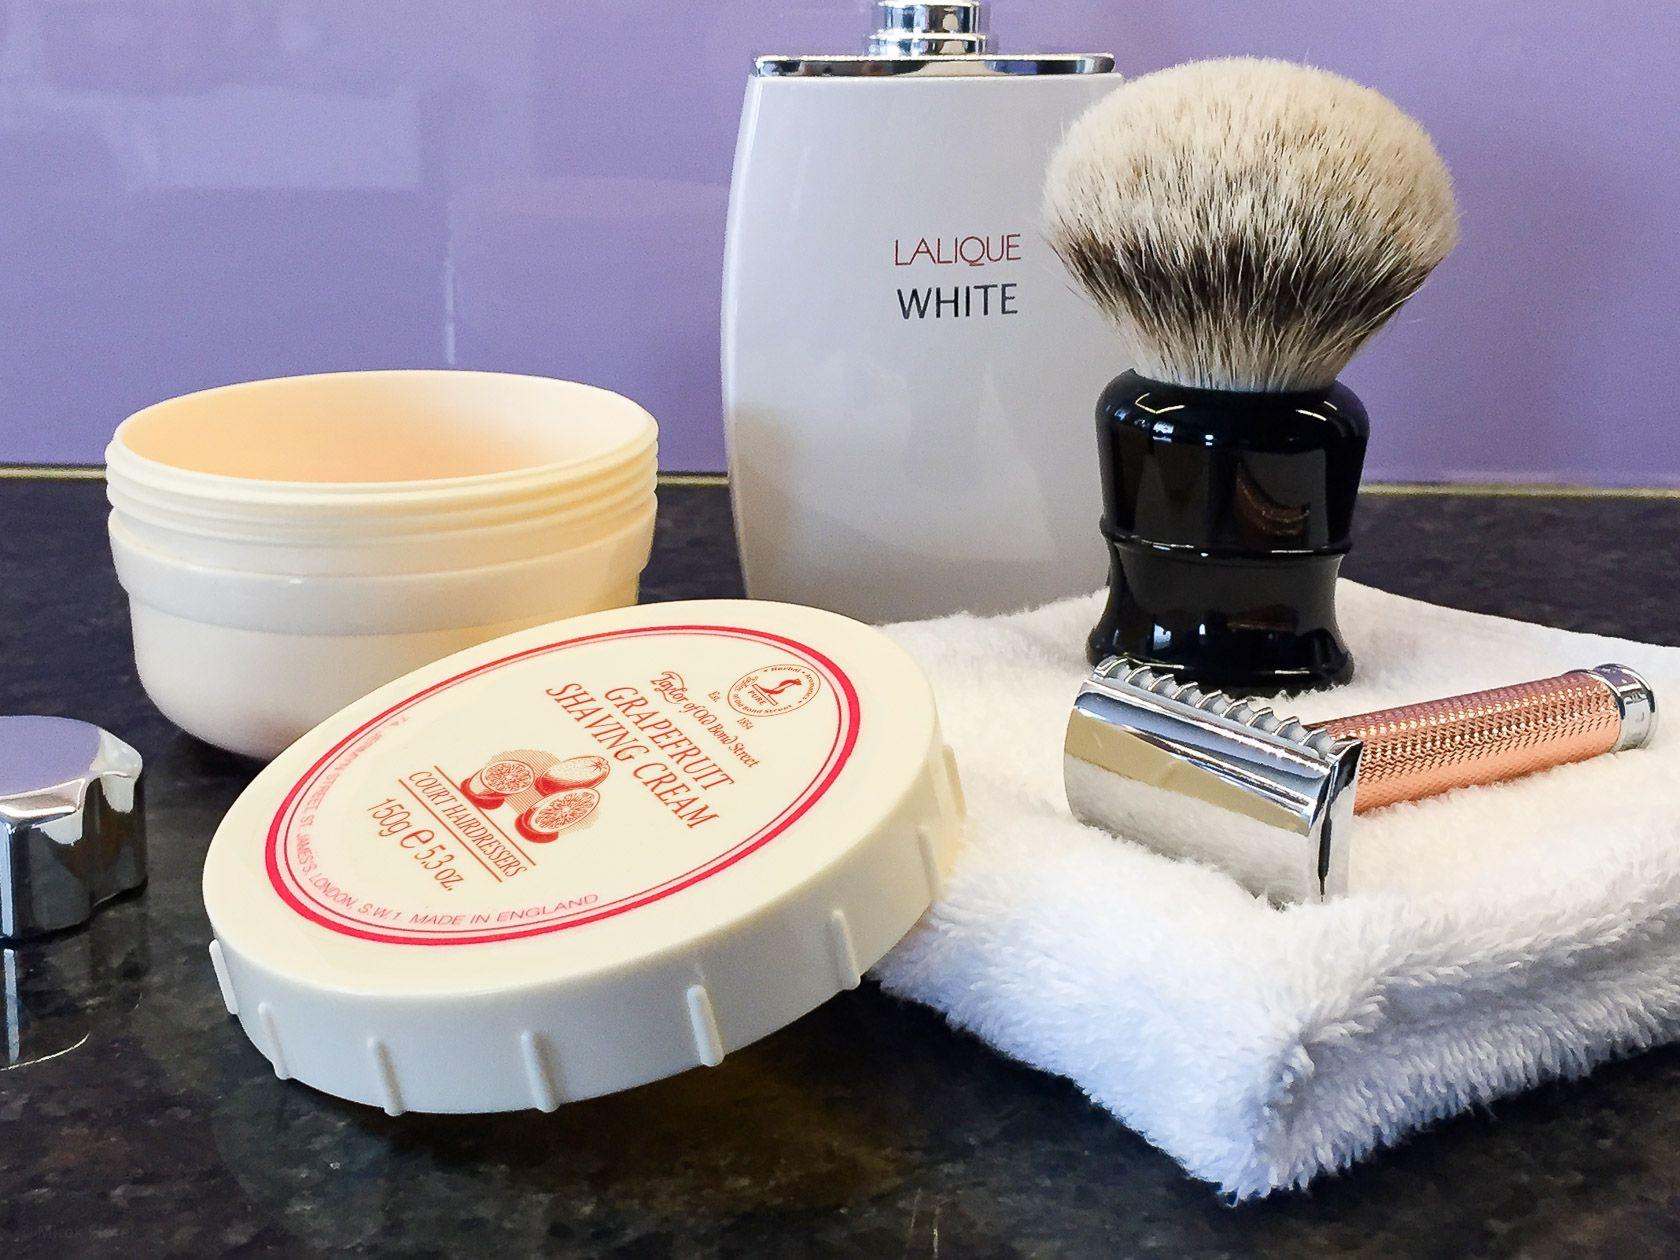 Golenie z użyciem Taylor of Old Bond Street Grapefruit Shaving Cream